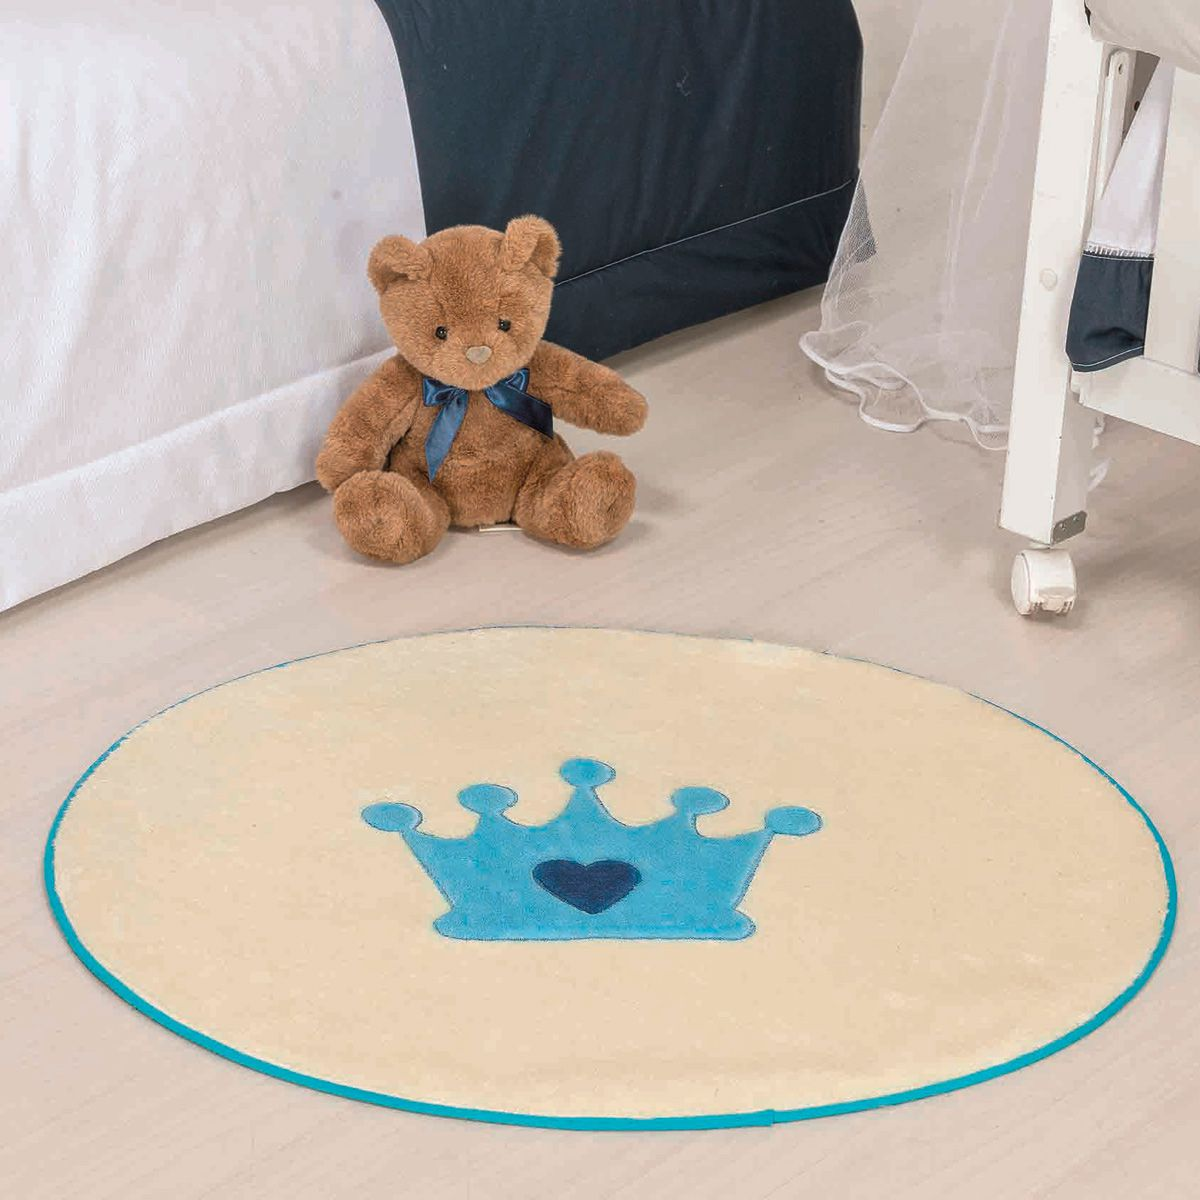 Tapete Infantil Premium Formato Coroa Baby Azul Turquesa 78cm x 68cm